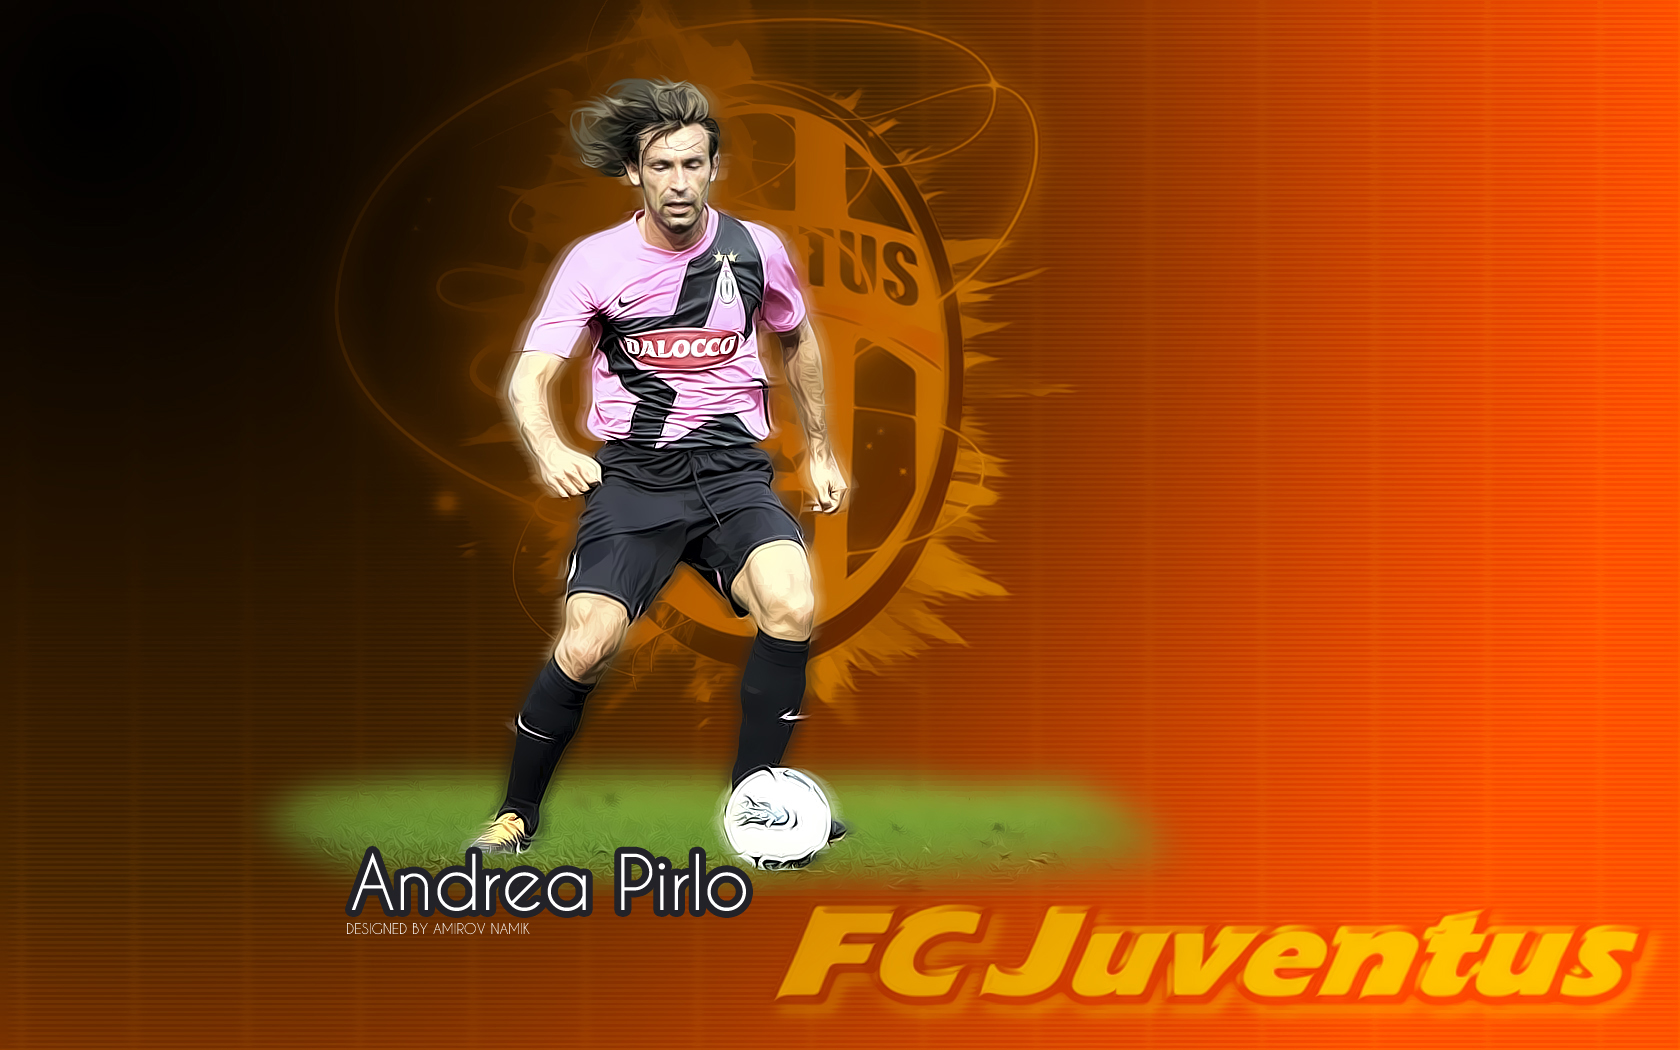 Wallpaper Andre Pirlo Juventus Mein Symbian